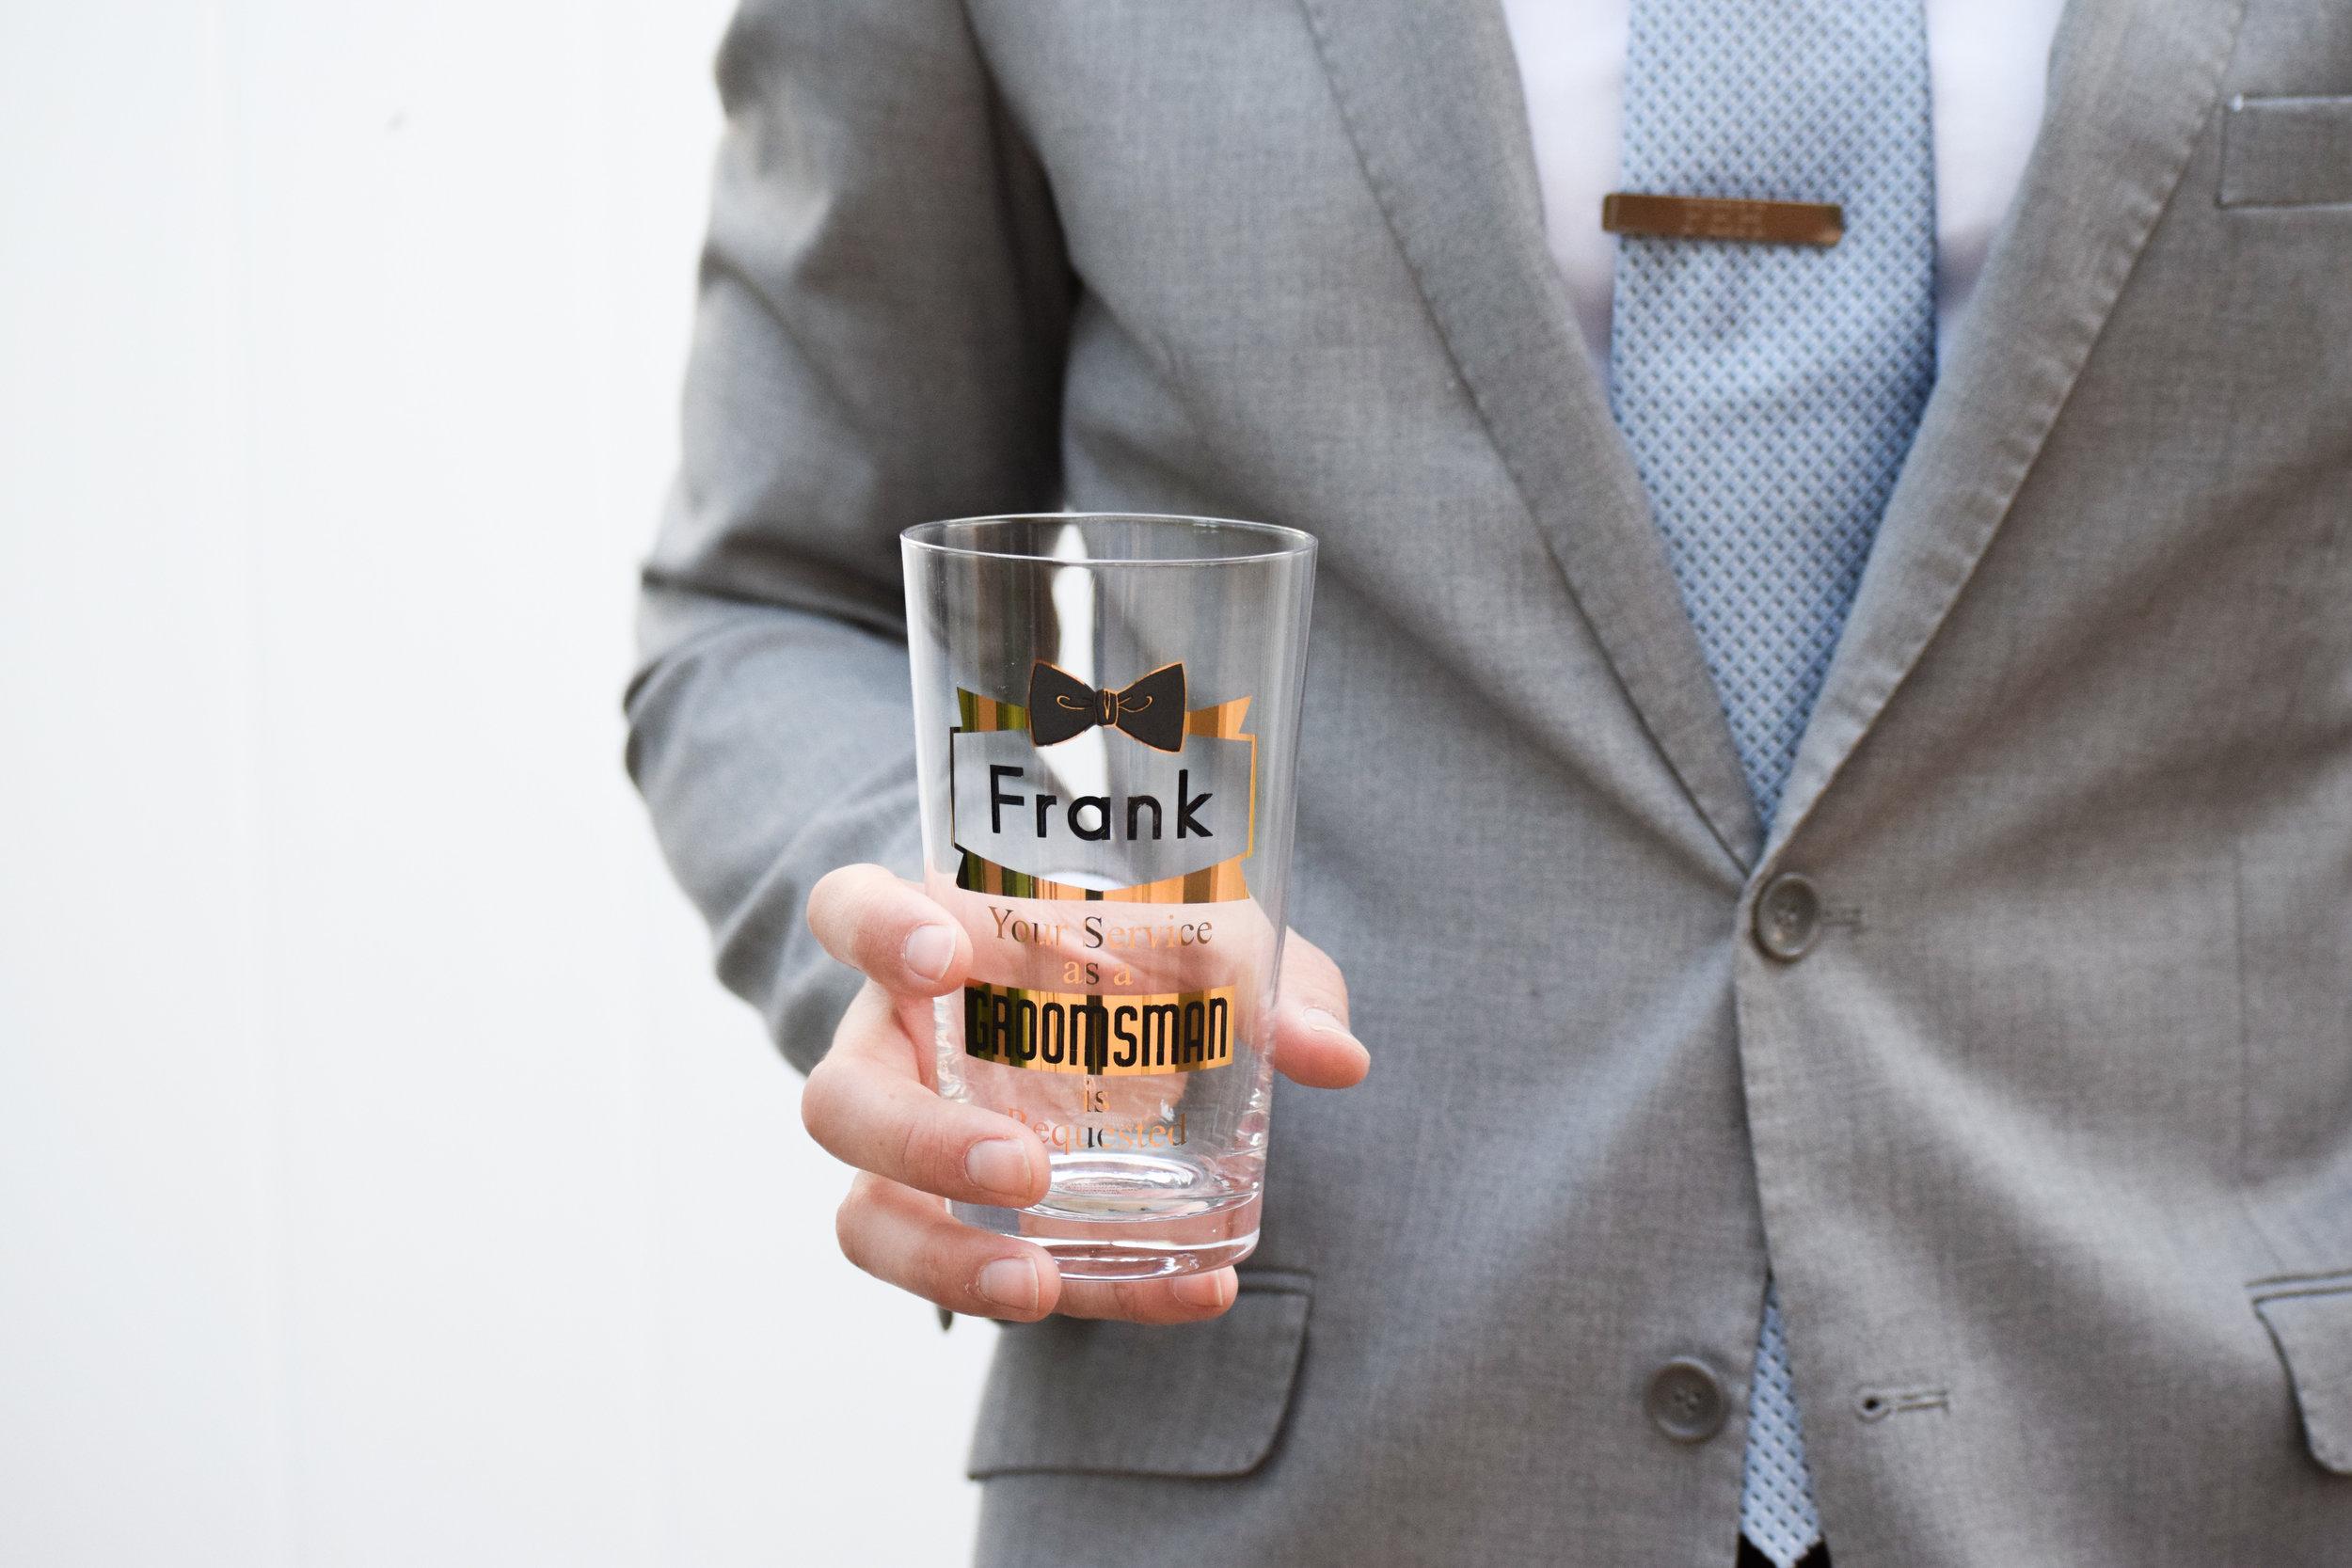 Groomsman Proposal Gift Ideas -- Groomsman Proposal Beer Glass - Things Remembered